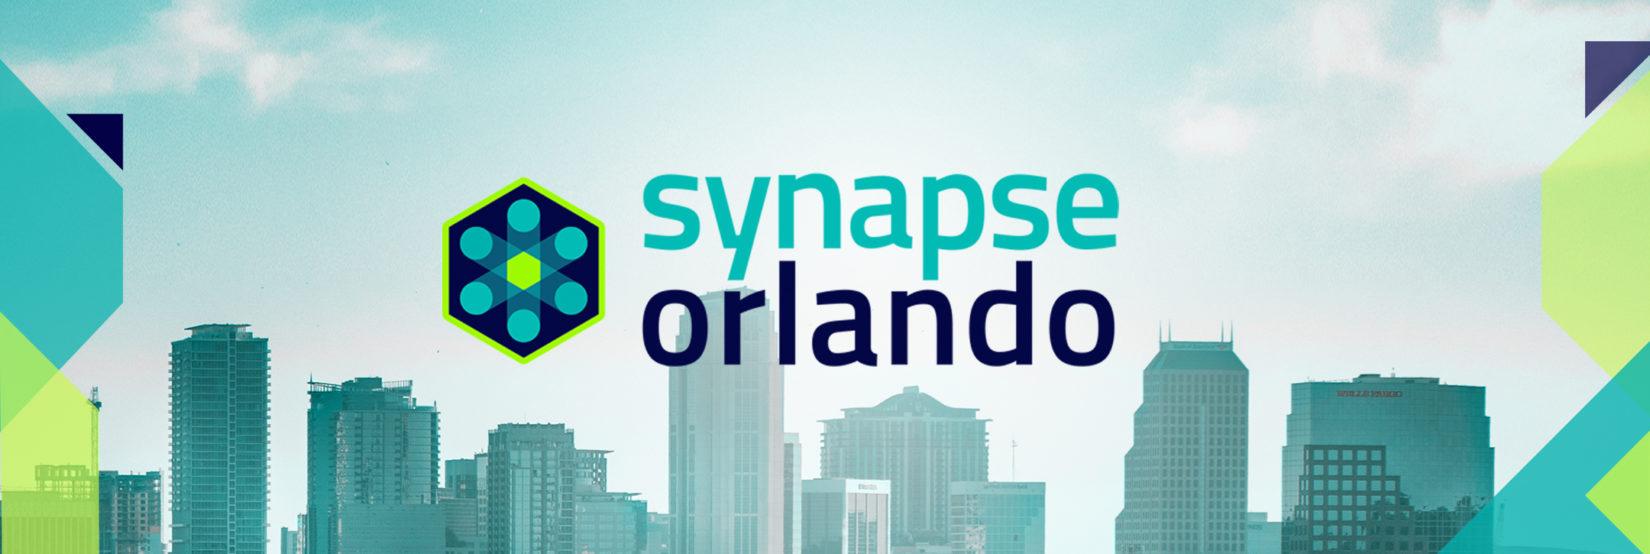 Synapse Orlando Web Header